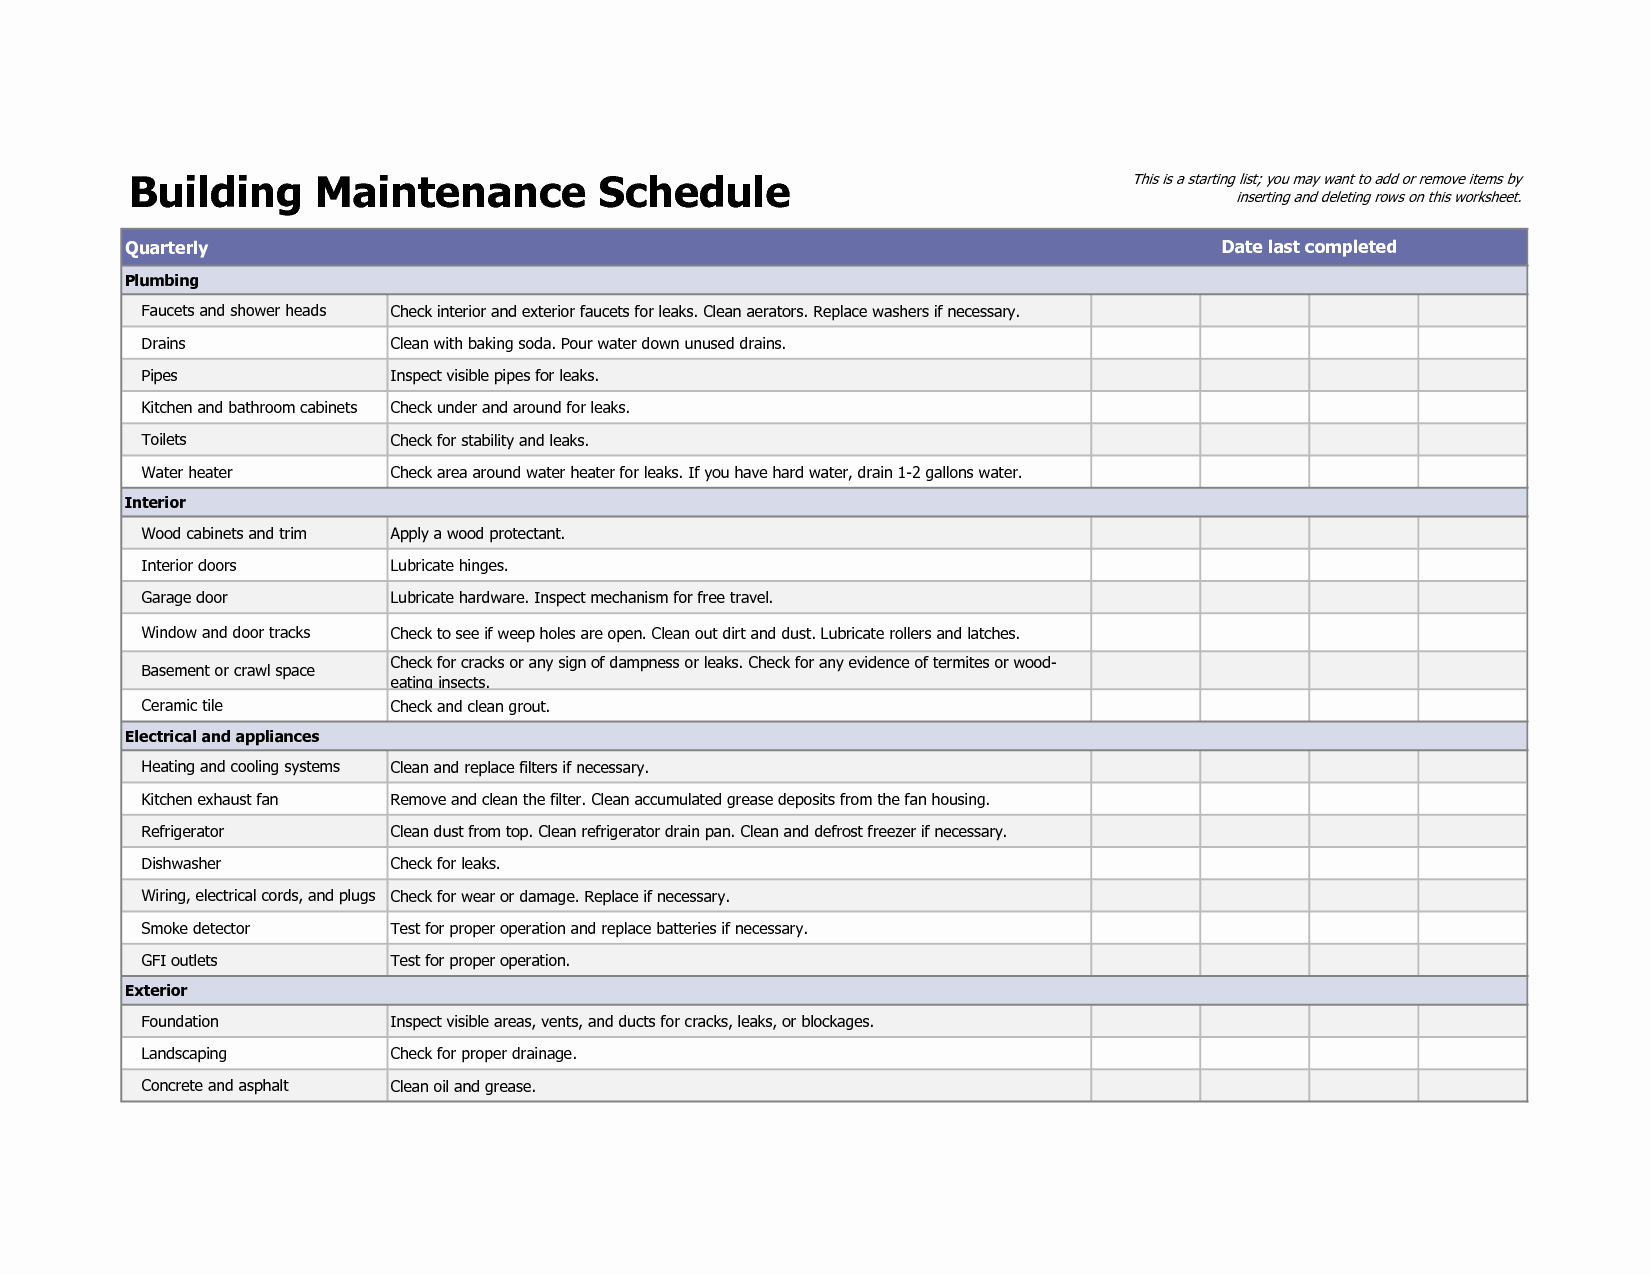 Building Maintenance Schedule Template Fresh Building Maintenance Schedule Excel Template